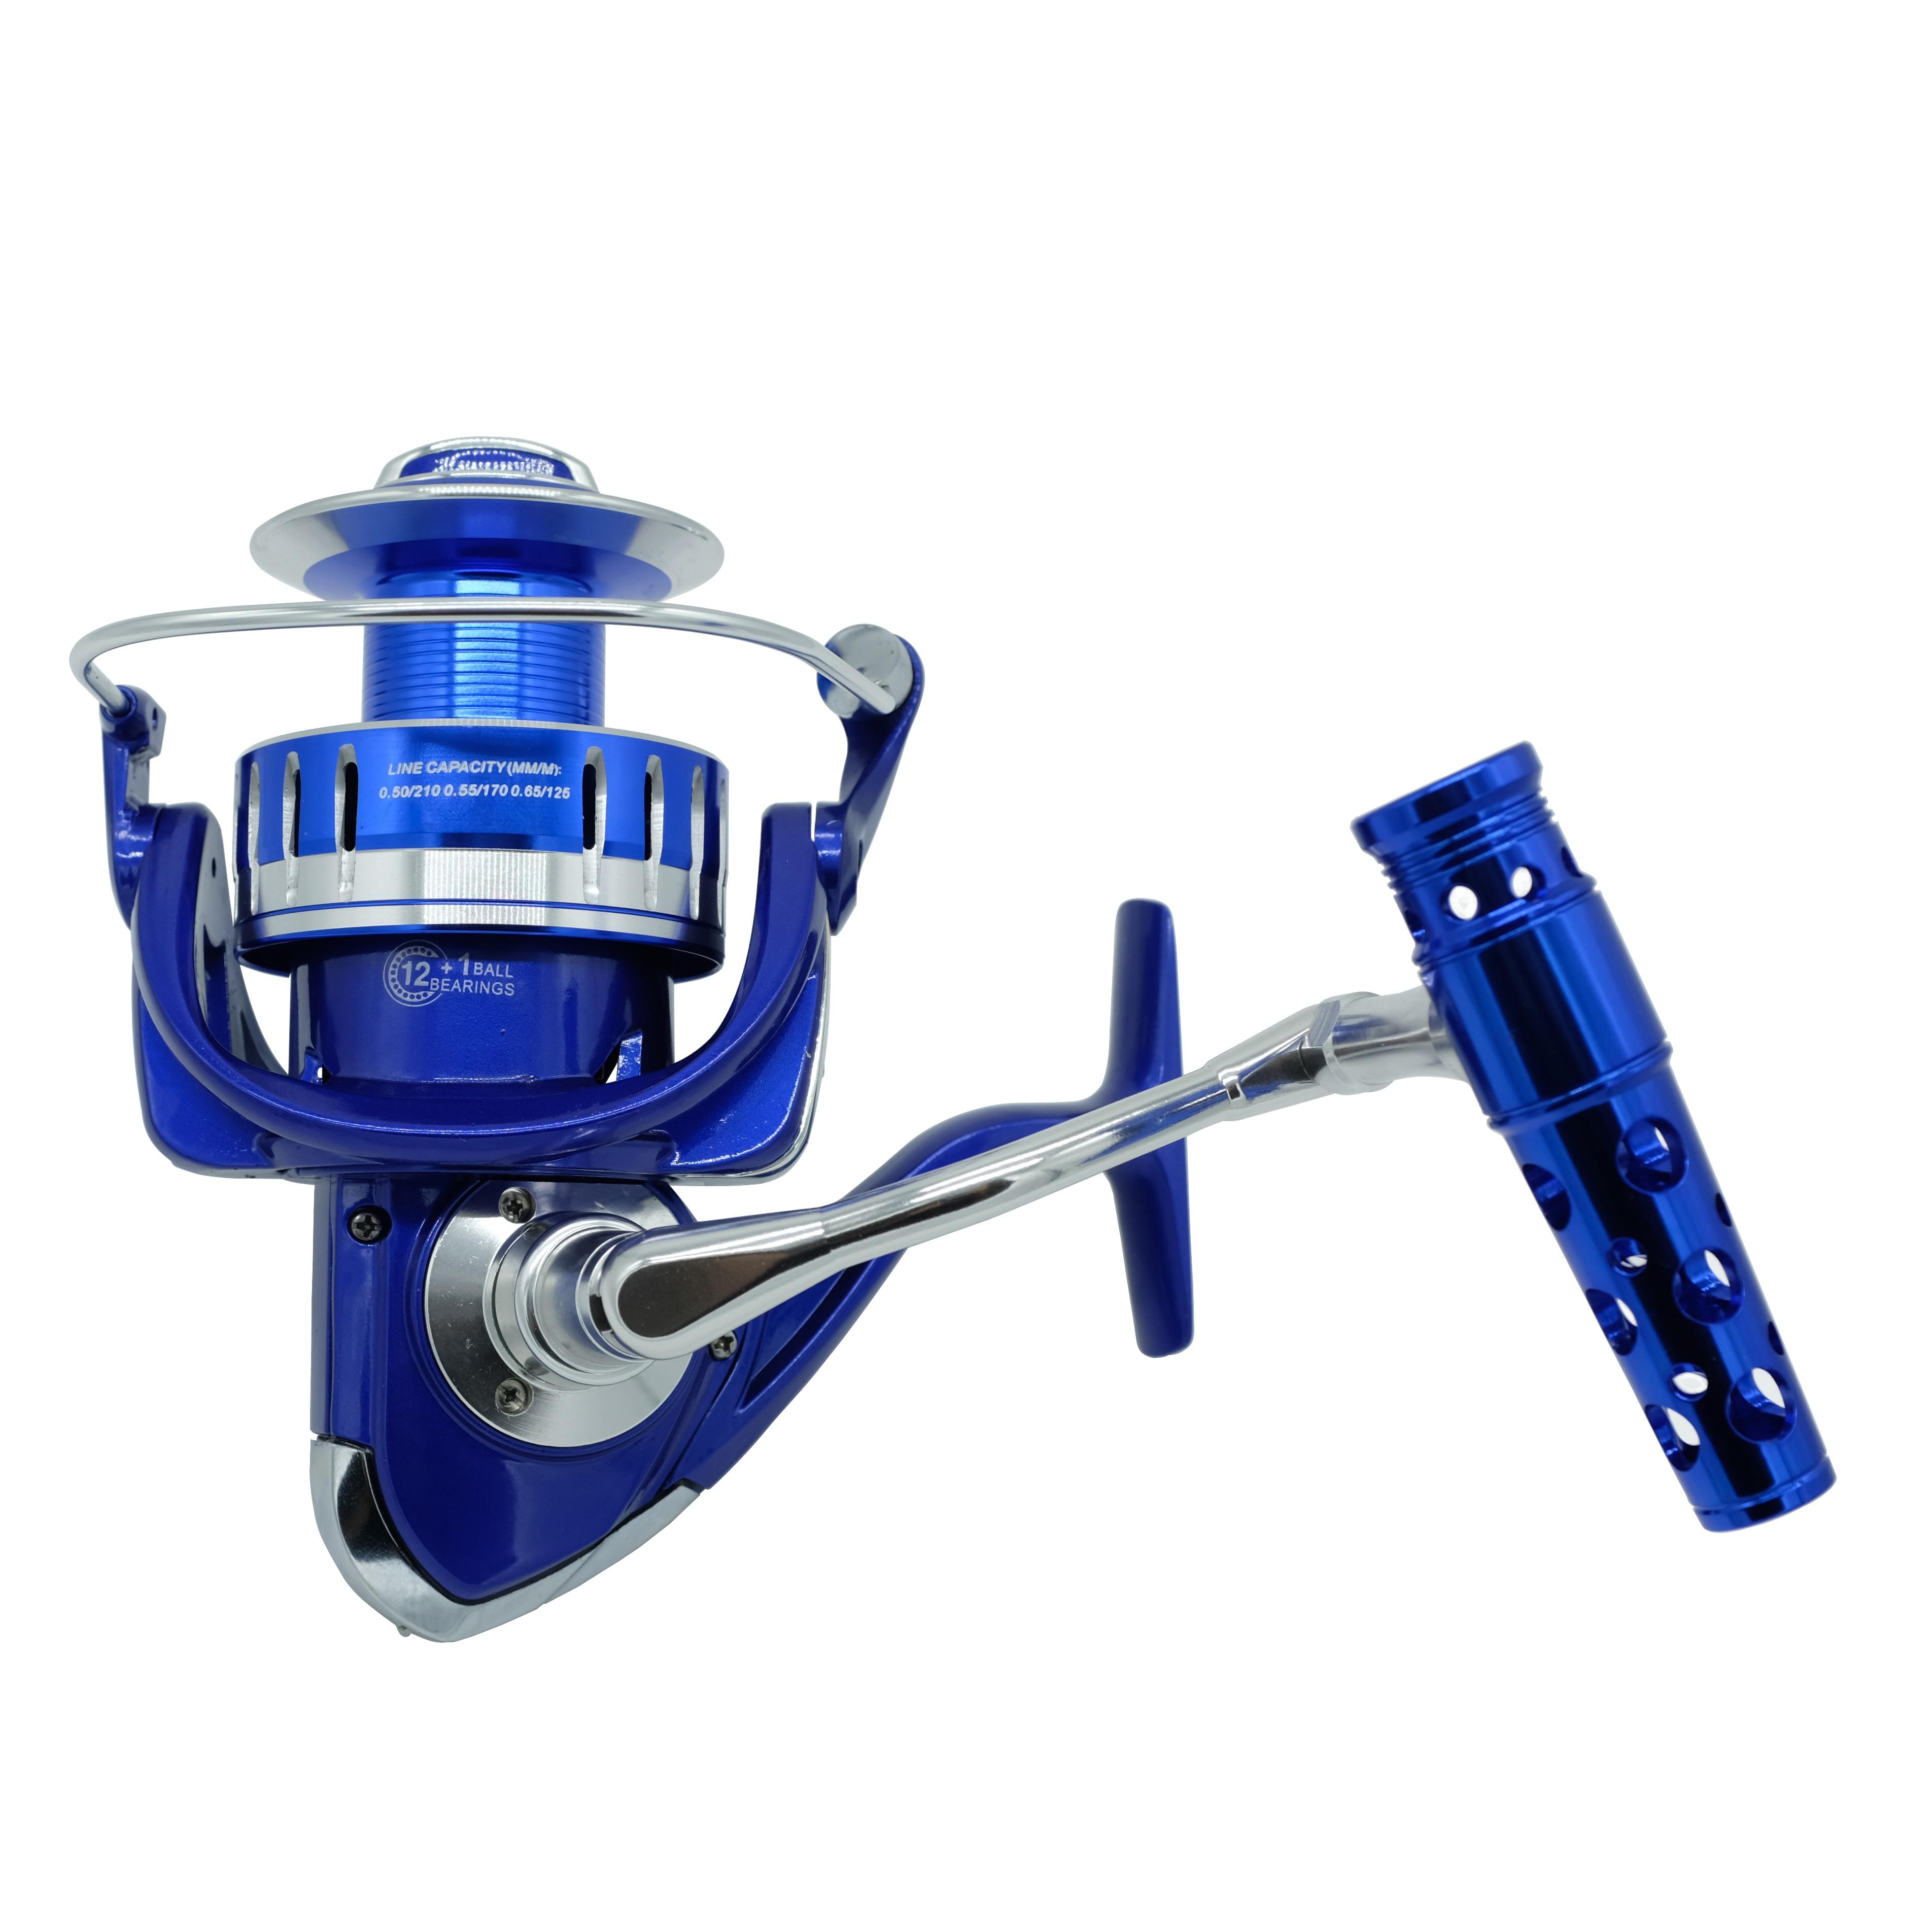 HiUmi Max 40KG Power Drag Saltiga Spinning Reels Heavy Duty Jigging Fishing Reel